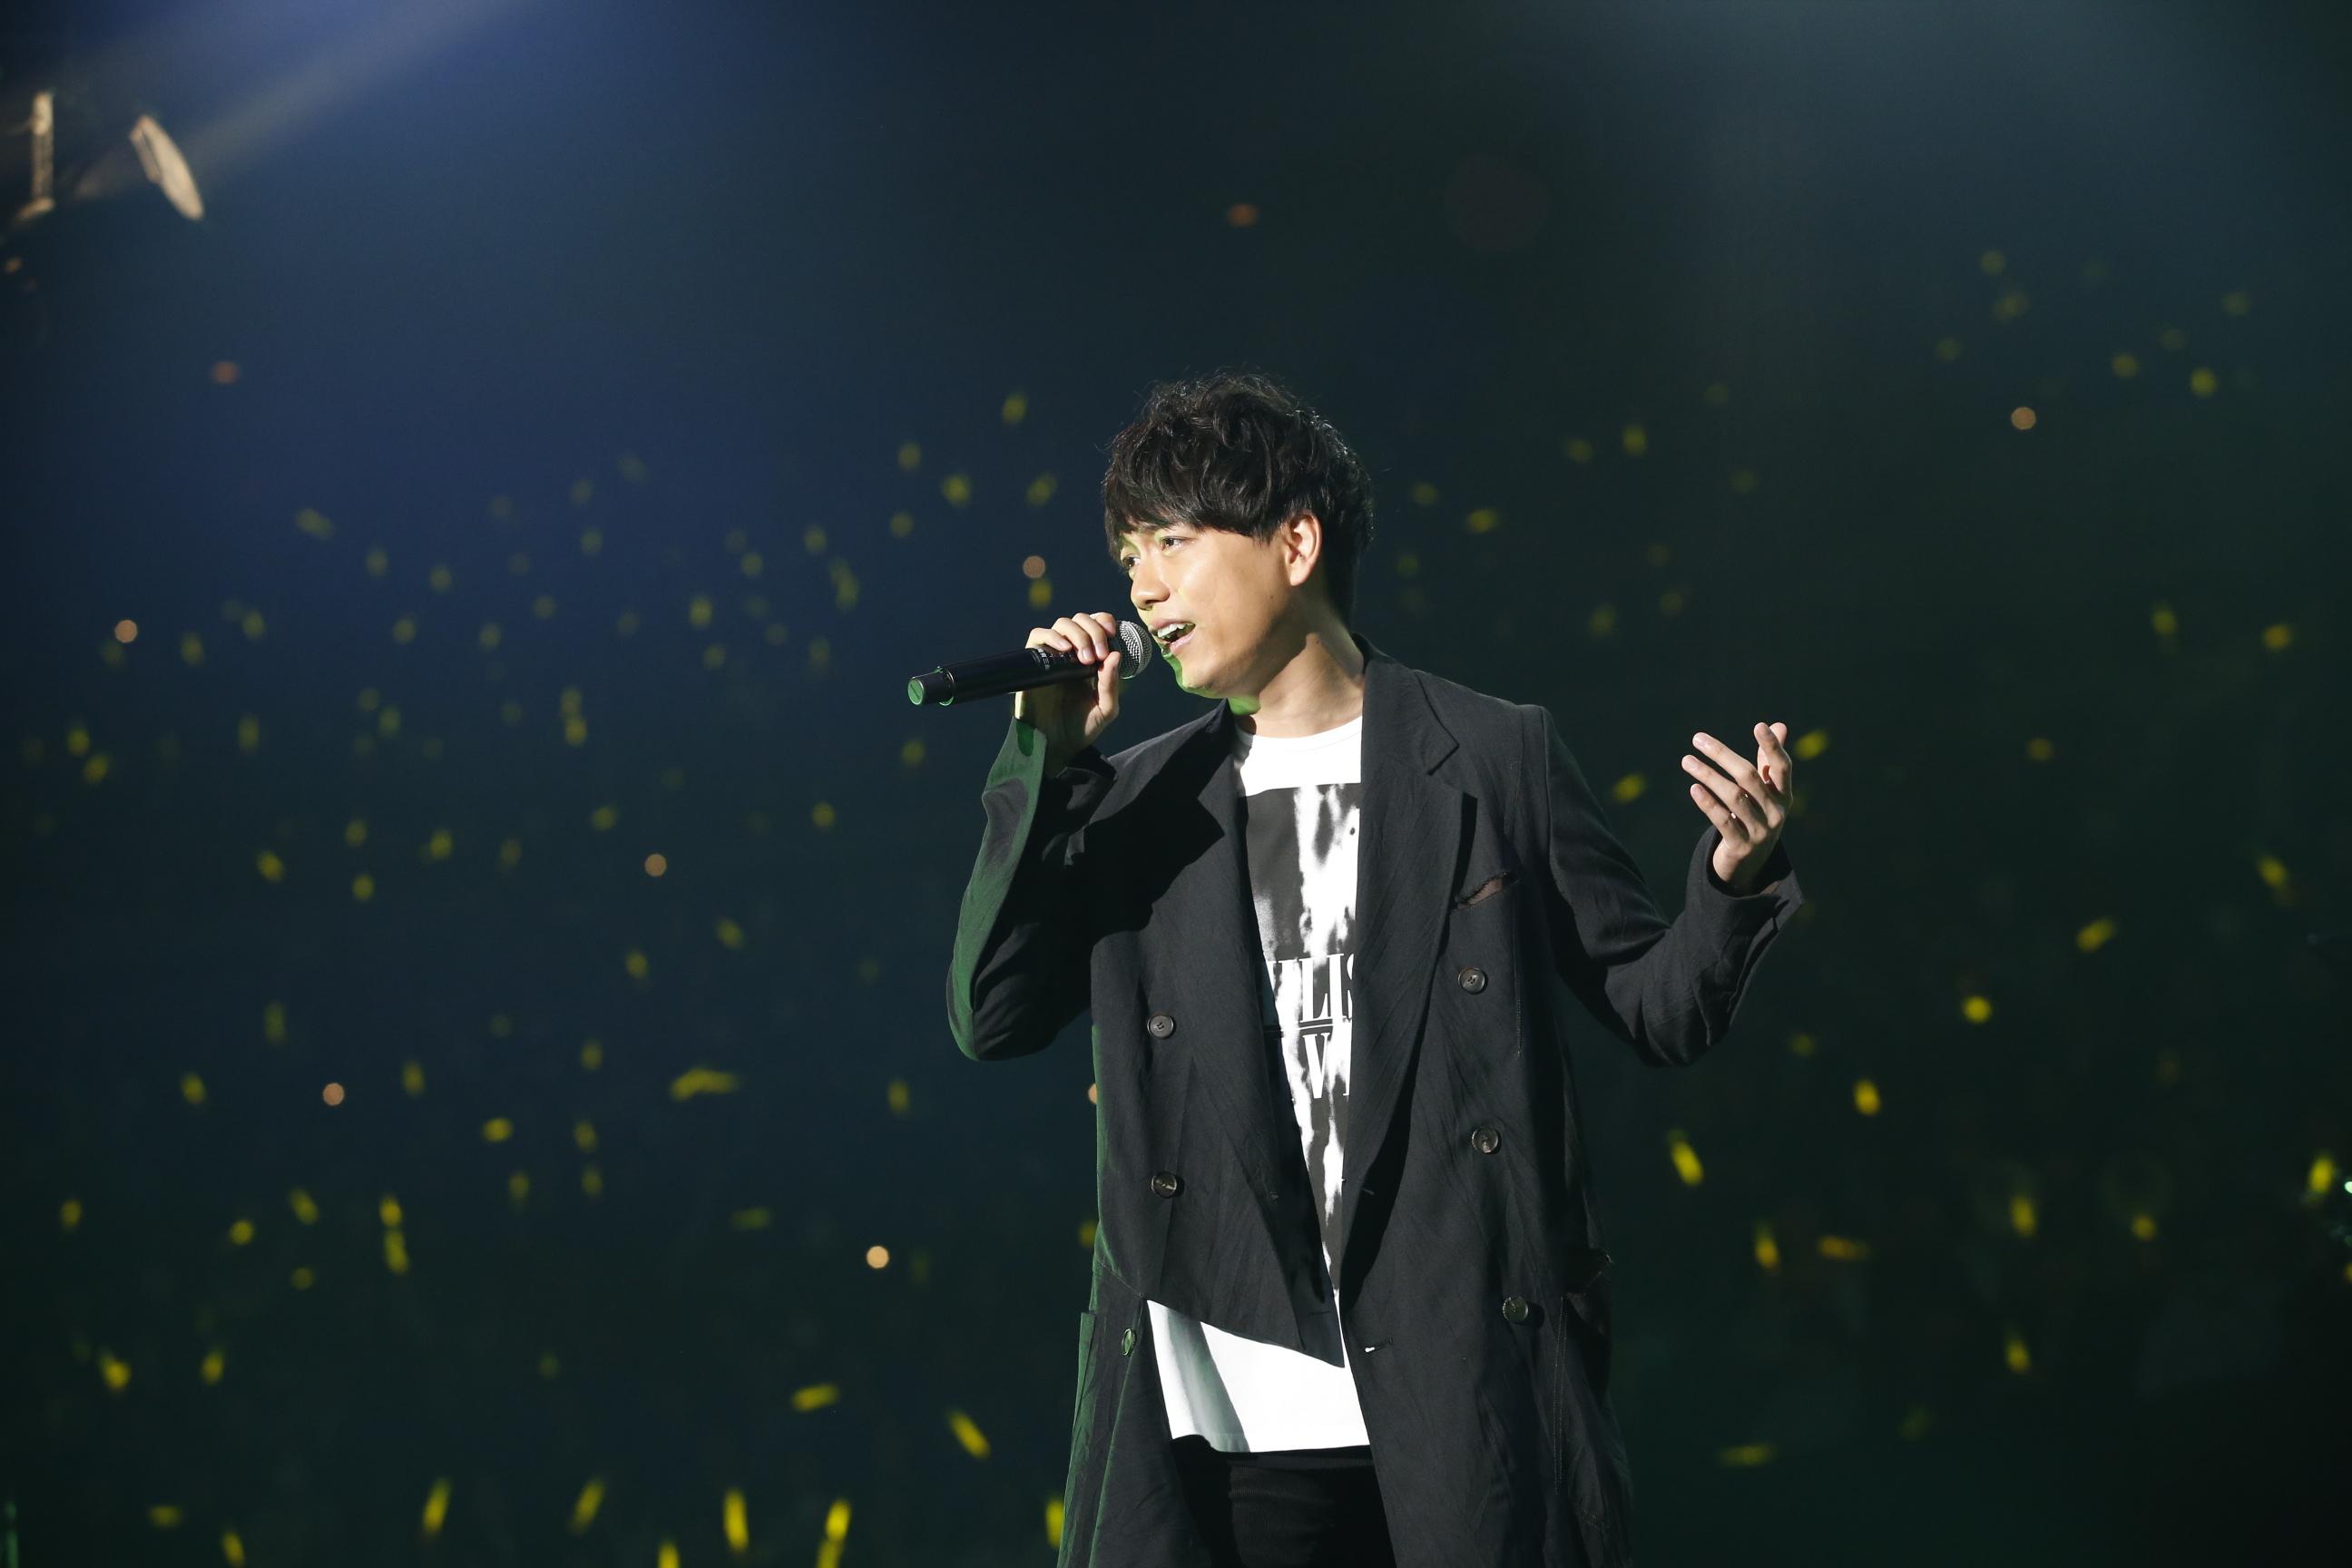 山崎育三郎 LIVE SDD 2018 OFFICIAL PHOTO